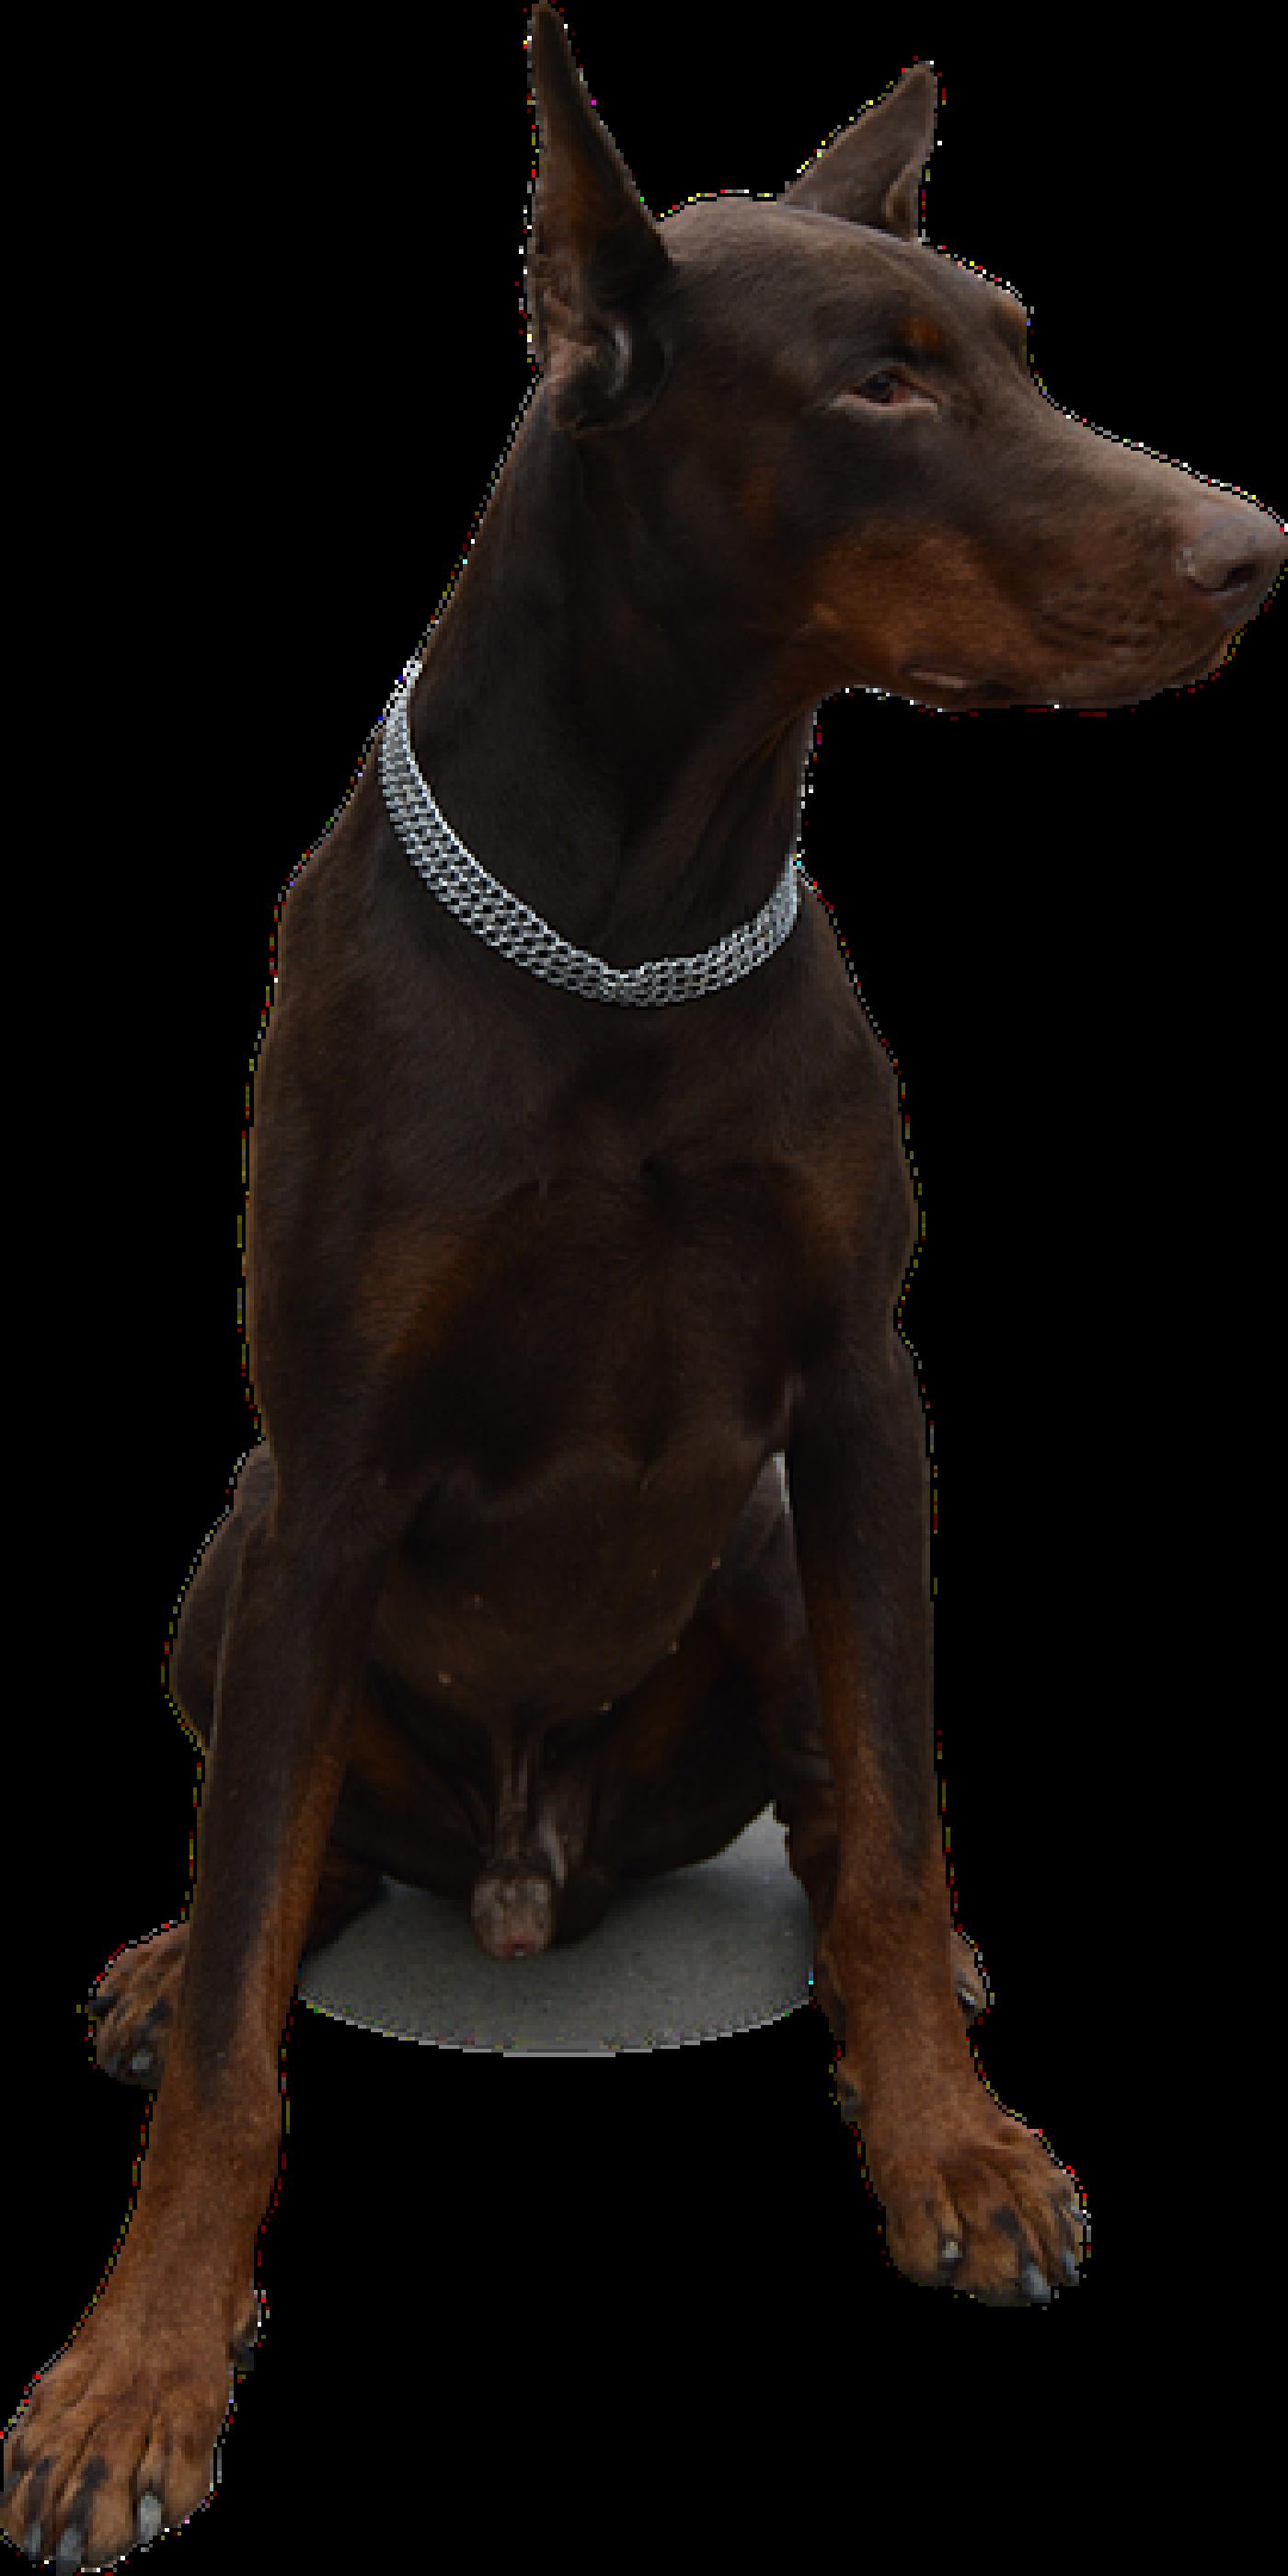 Guard Dog Practical Home Security Tips Toronto